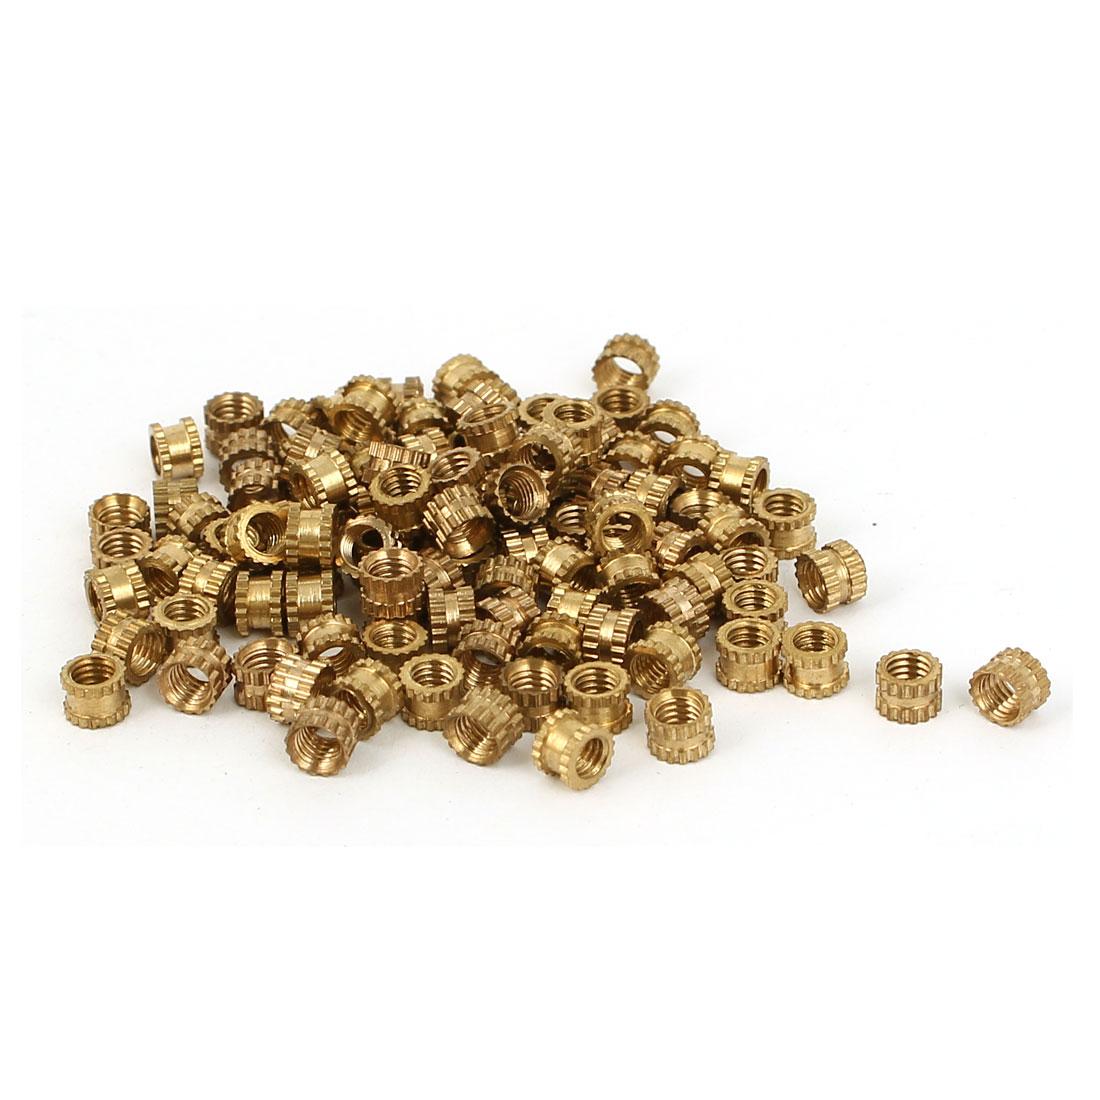 M3 x 4mm x 3mm Female Threaded Insert Embedded Brass Knurled Nuts Gold Tone 100 Pcs